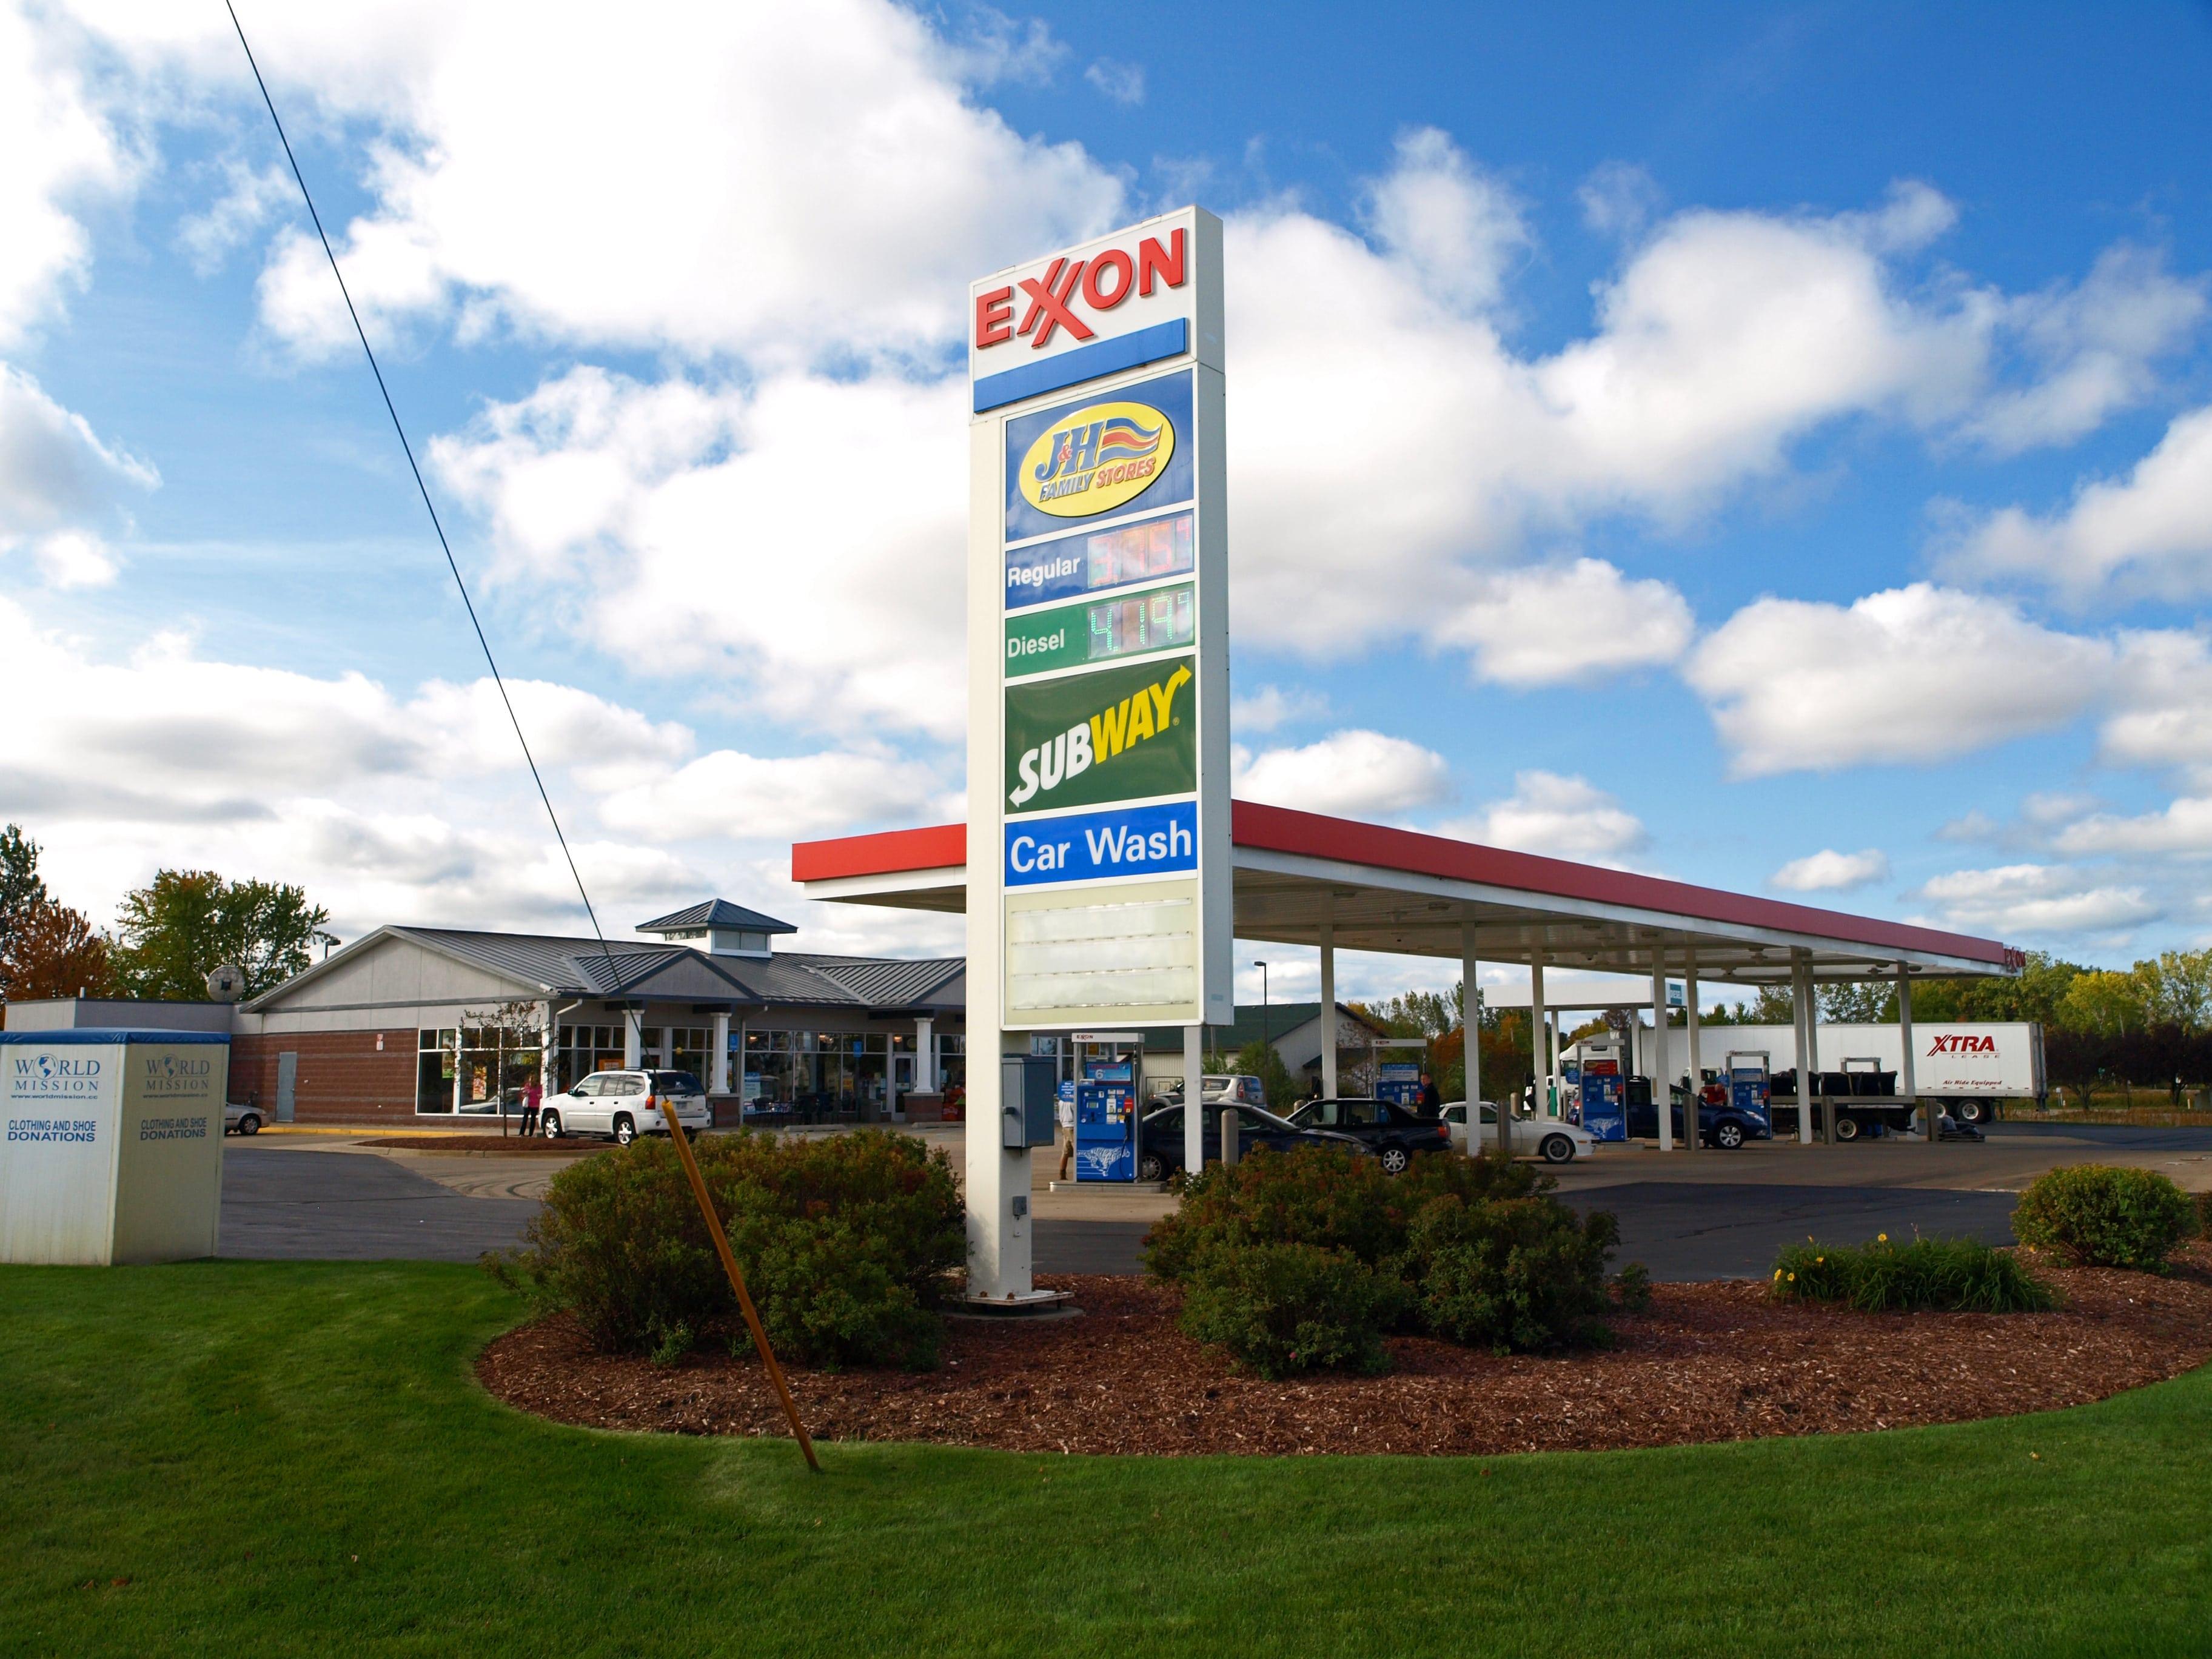 Olive Exxon